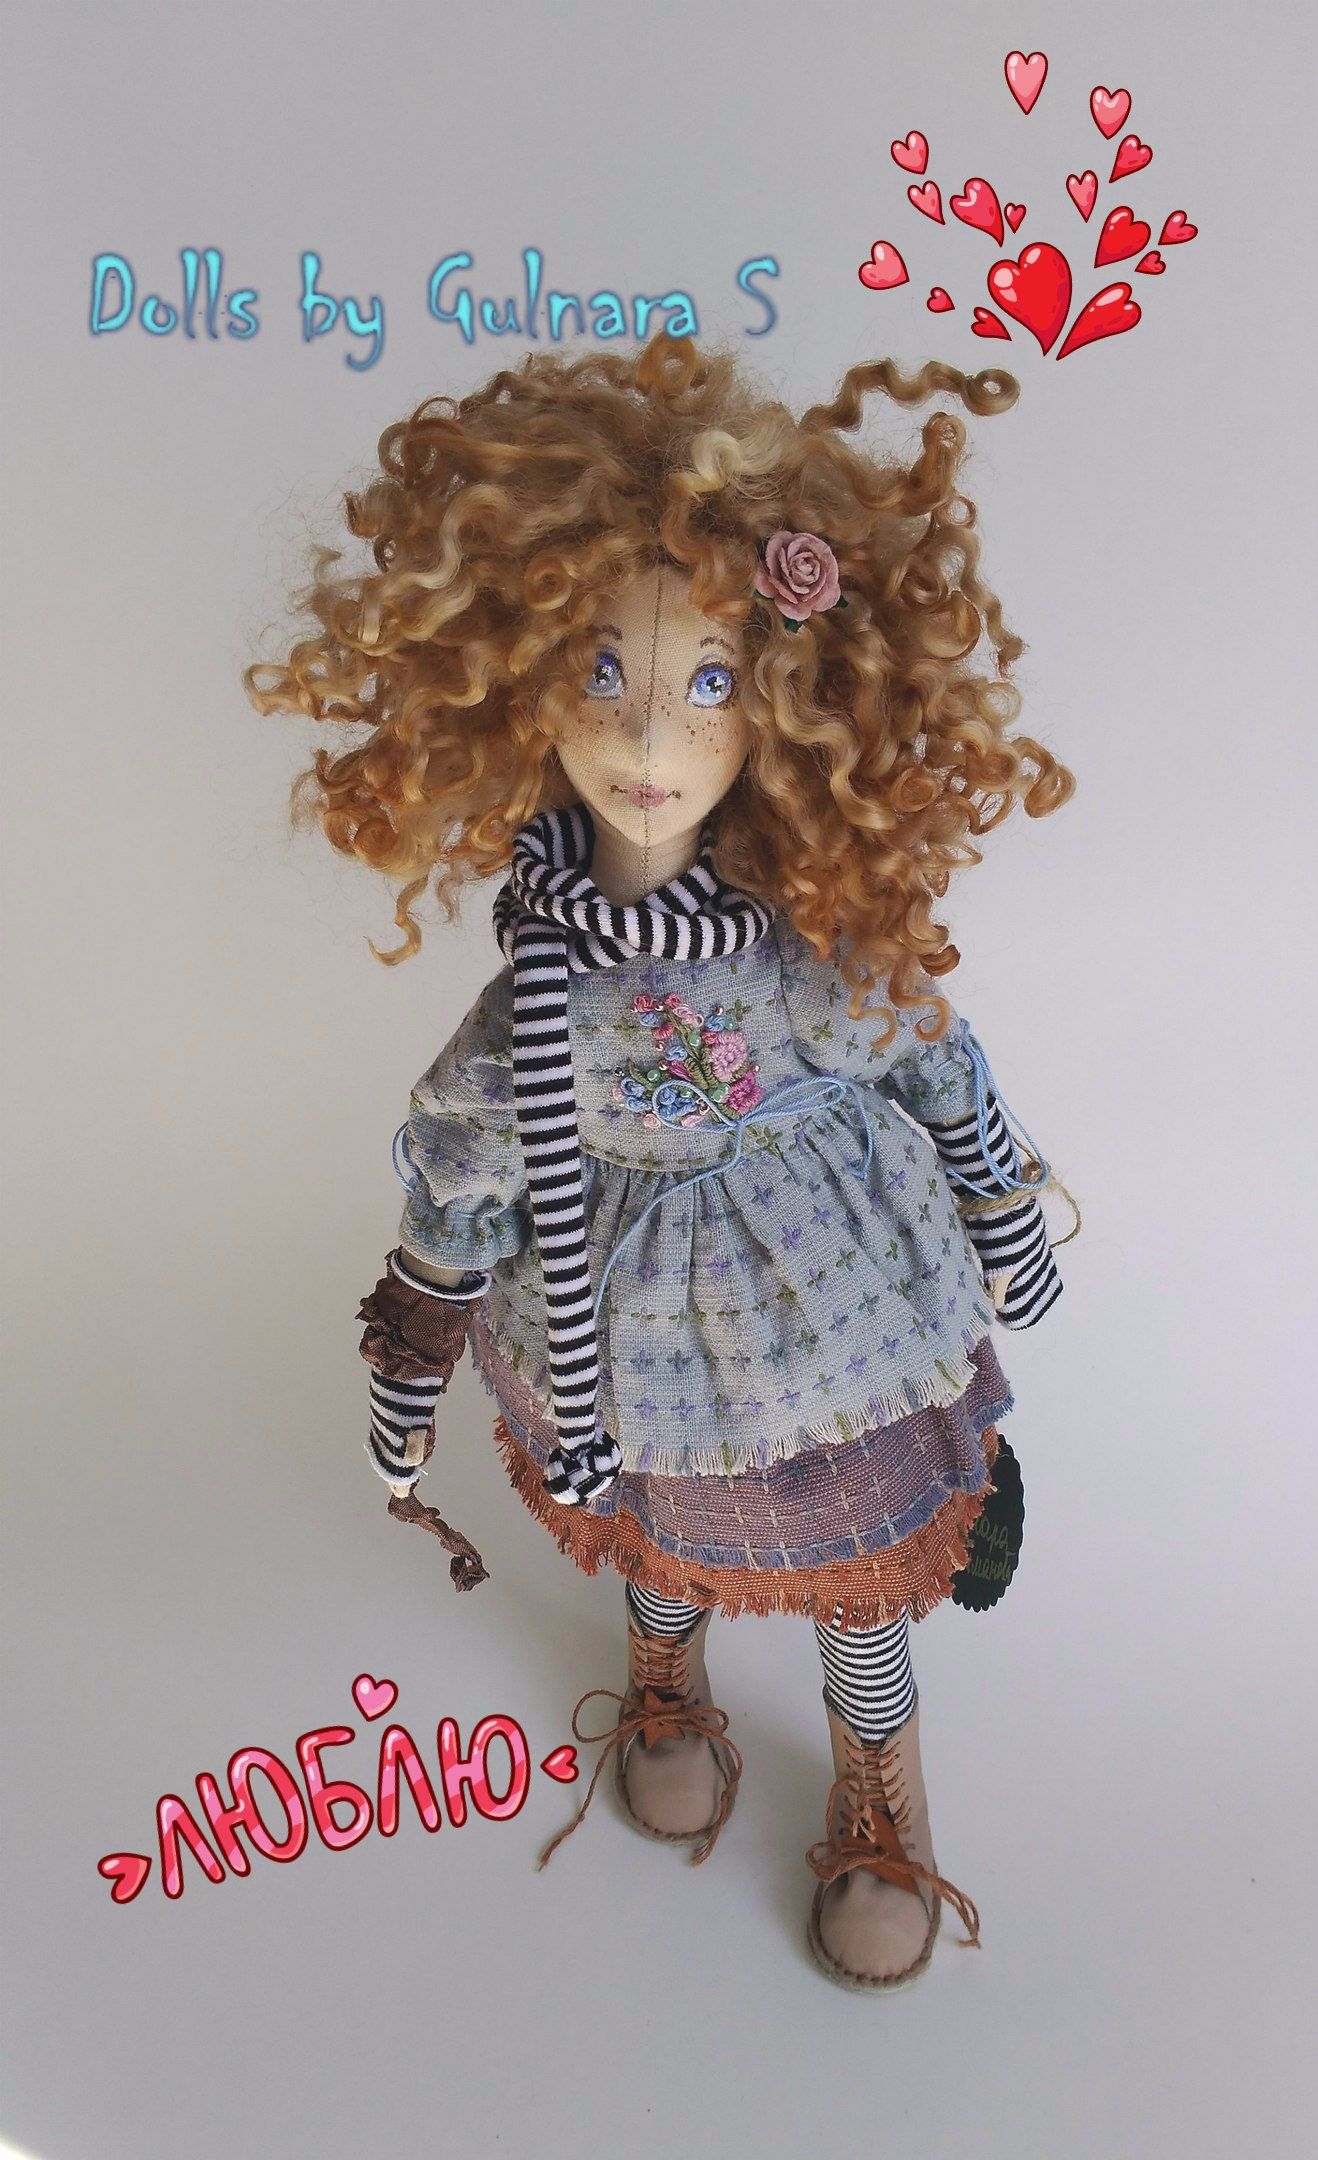 tilda подарок кукла купить работа коллекционная розовый коллекционнаякукла ручная куклыгульнары надо каркасная гульнары серый голубой тильда handmade красивые куклы текстильнаякукла